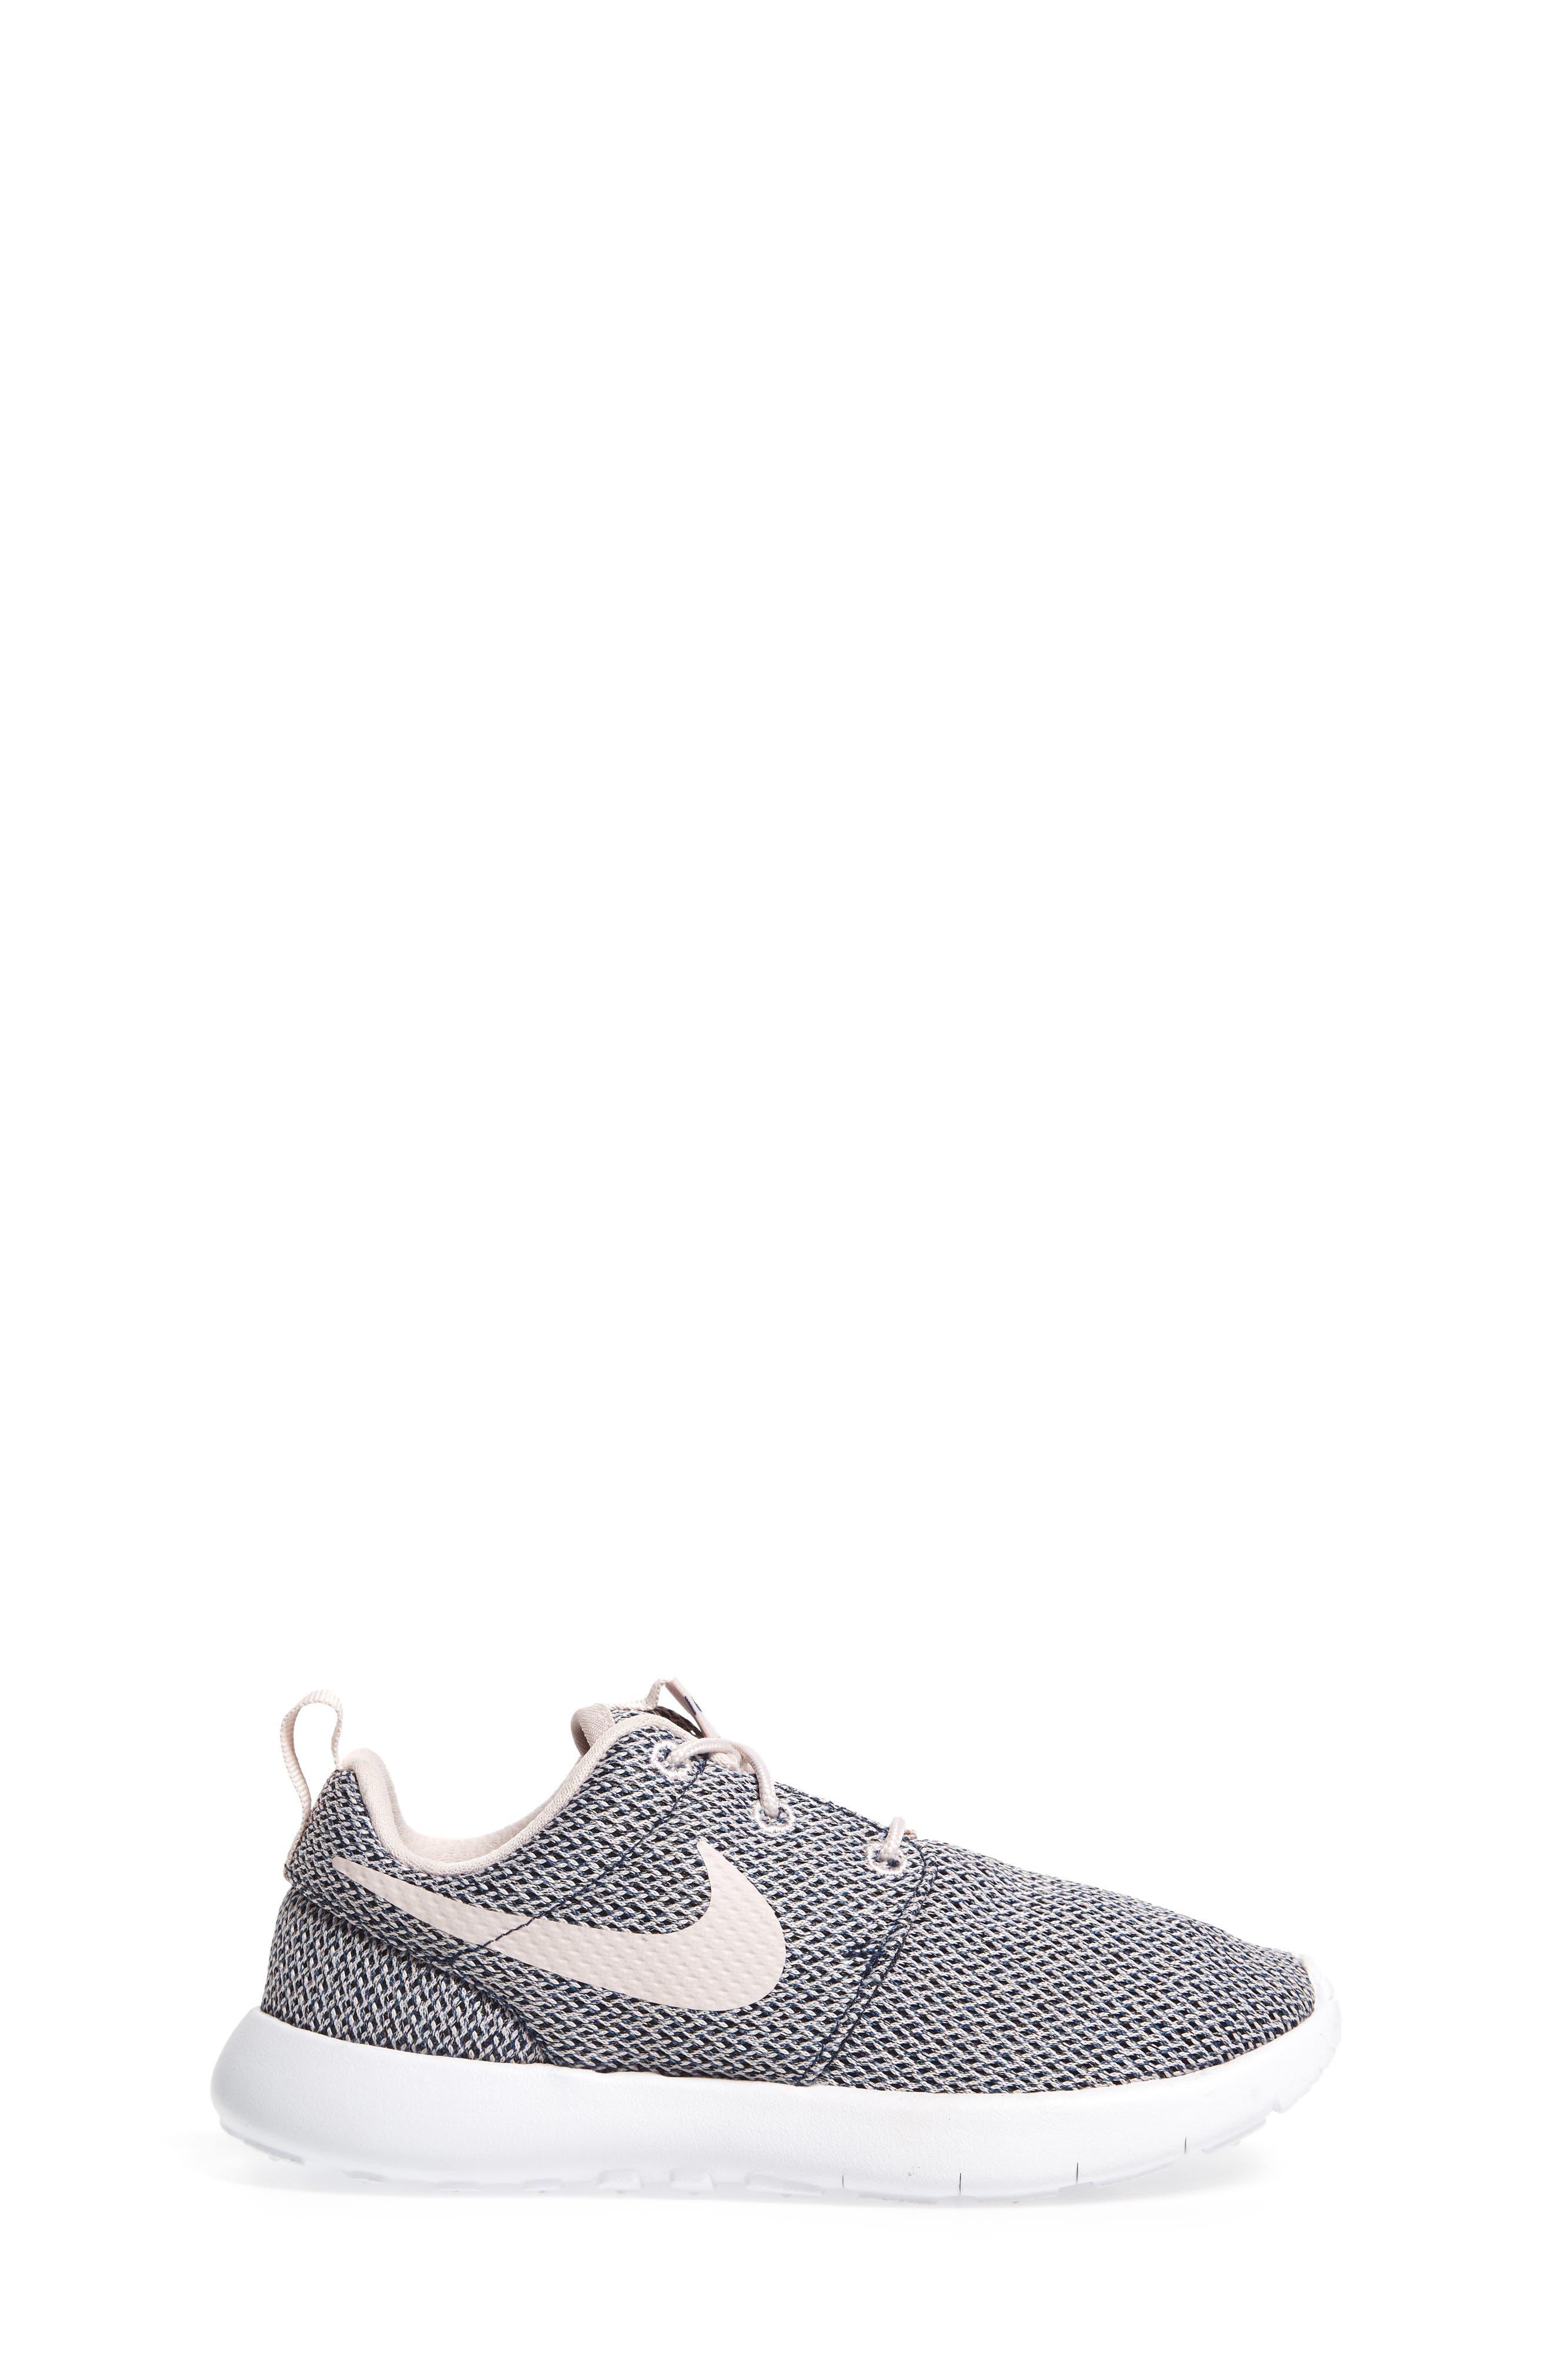 'Roshe Run' Athletic Shoe,                             Alternate thumbnail 114, color,